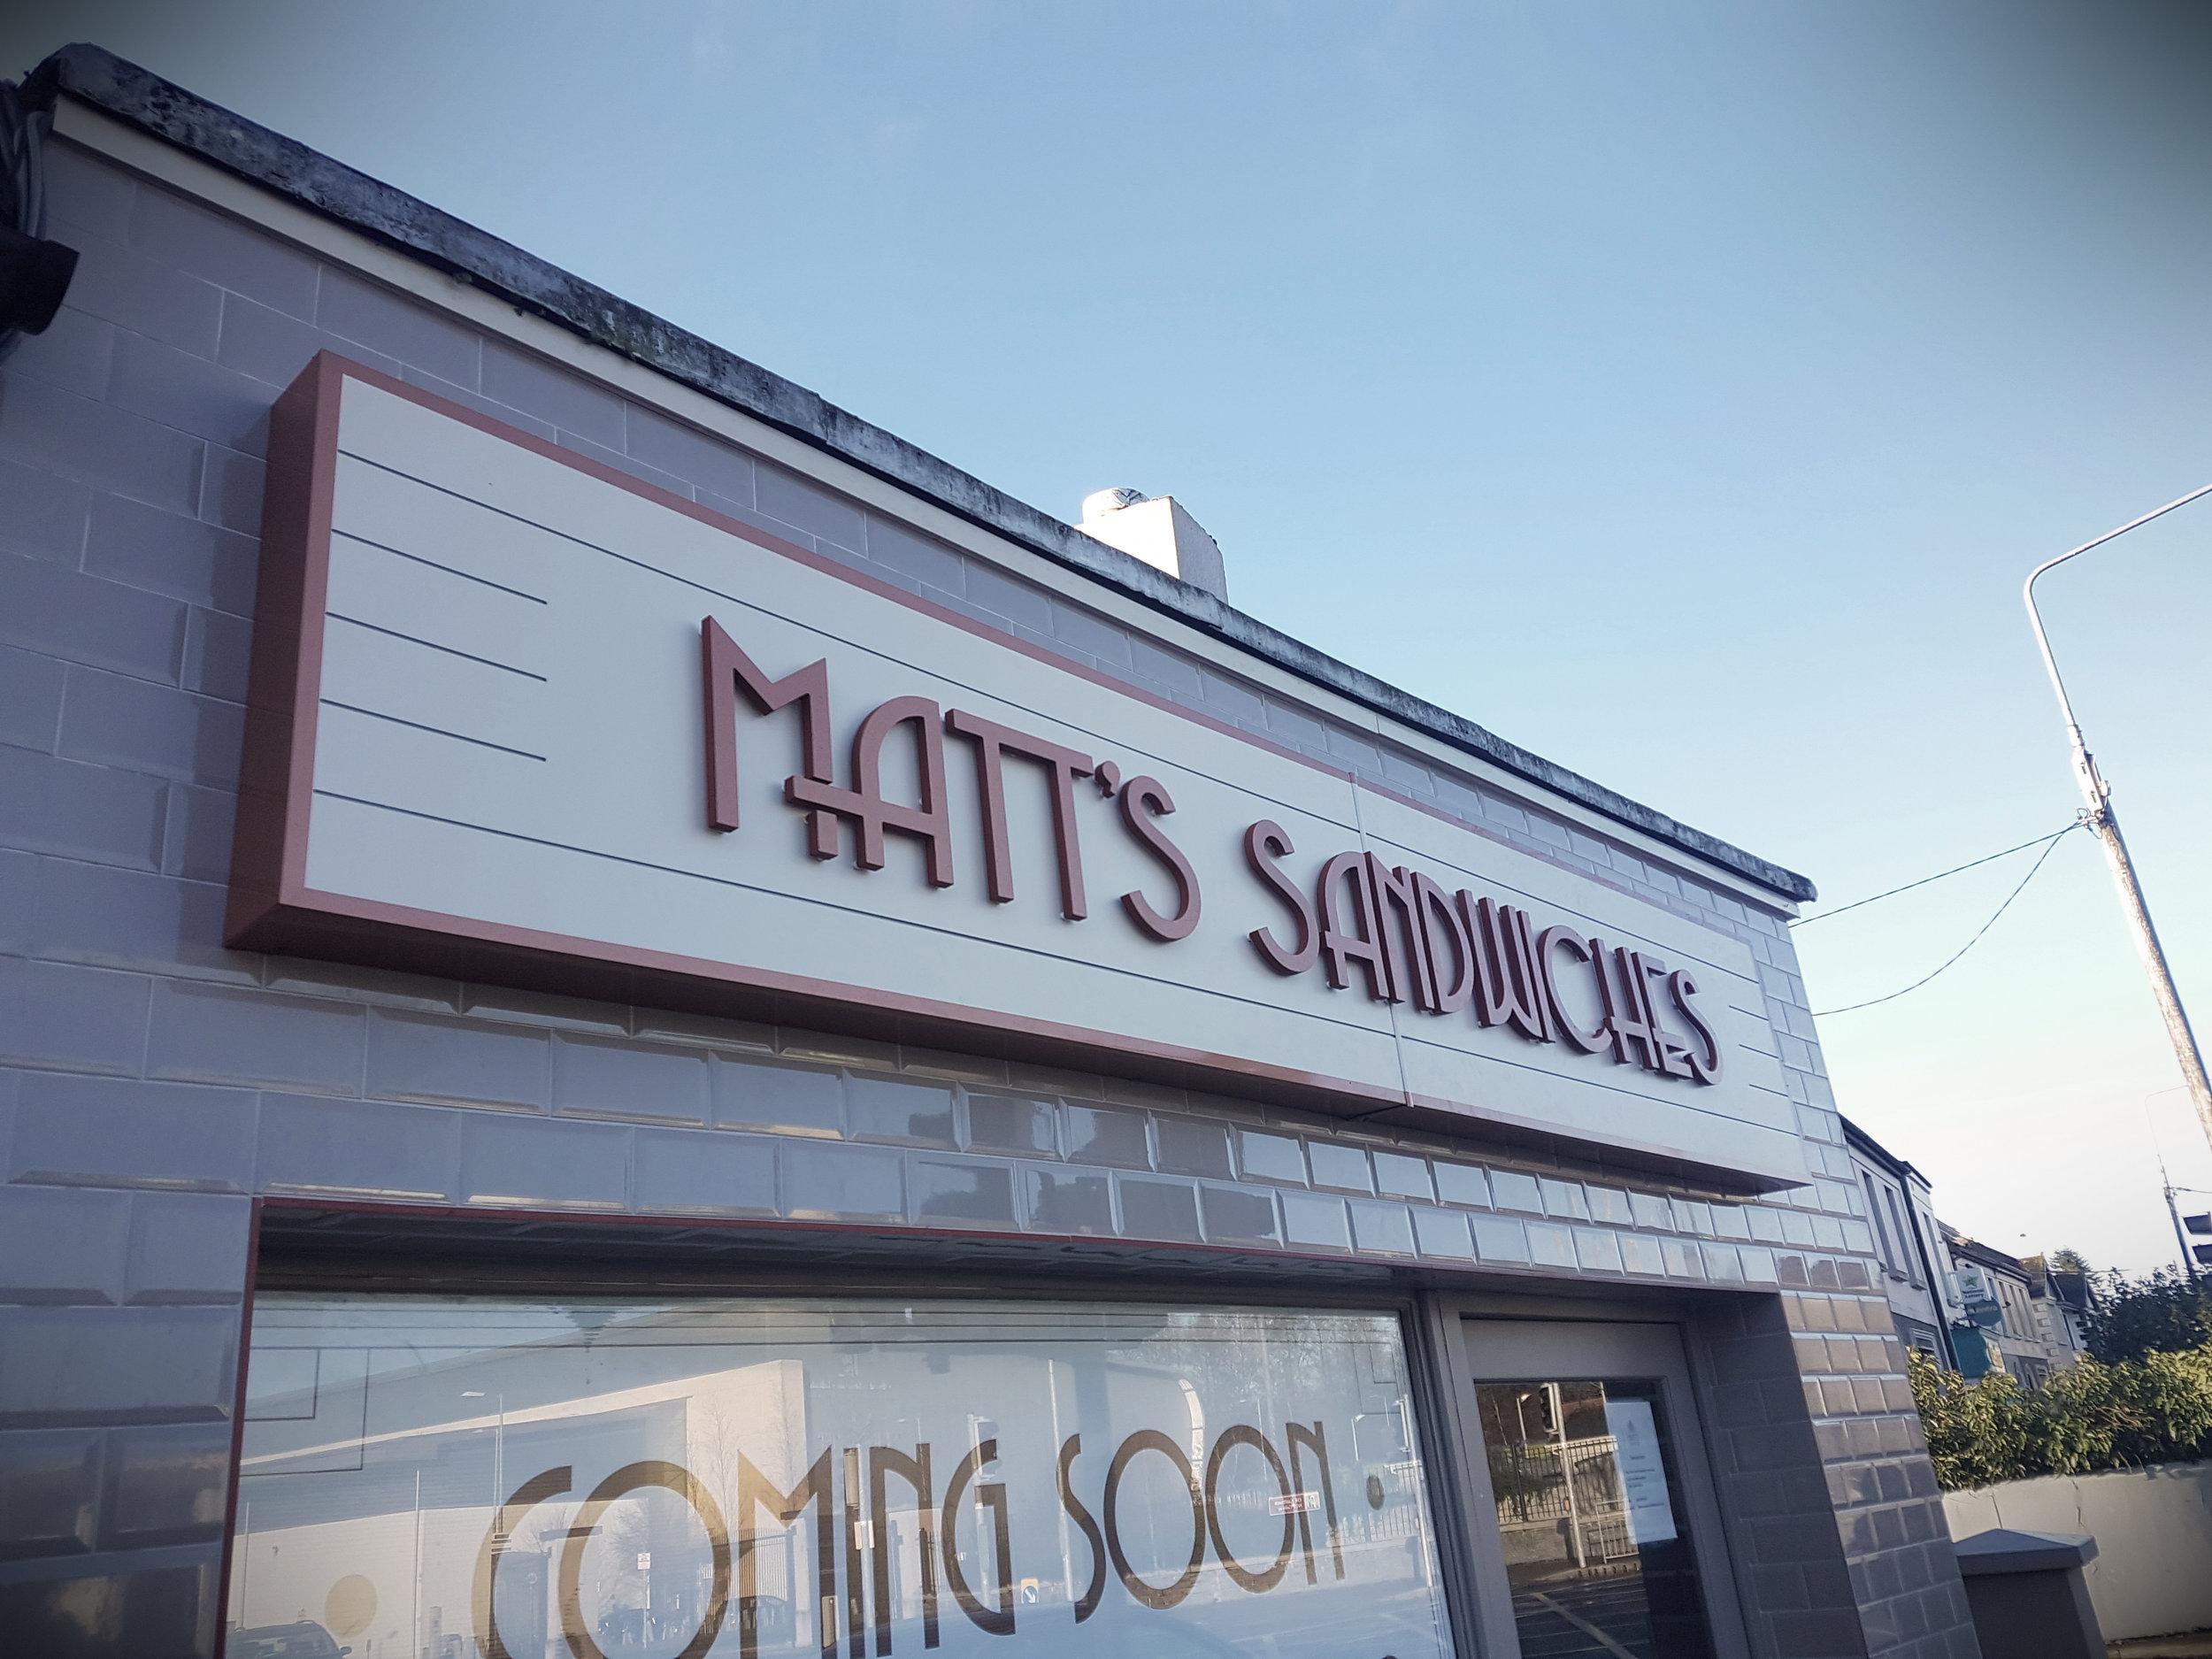 Matts Sandwiches